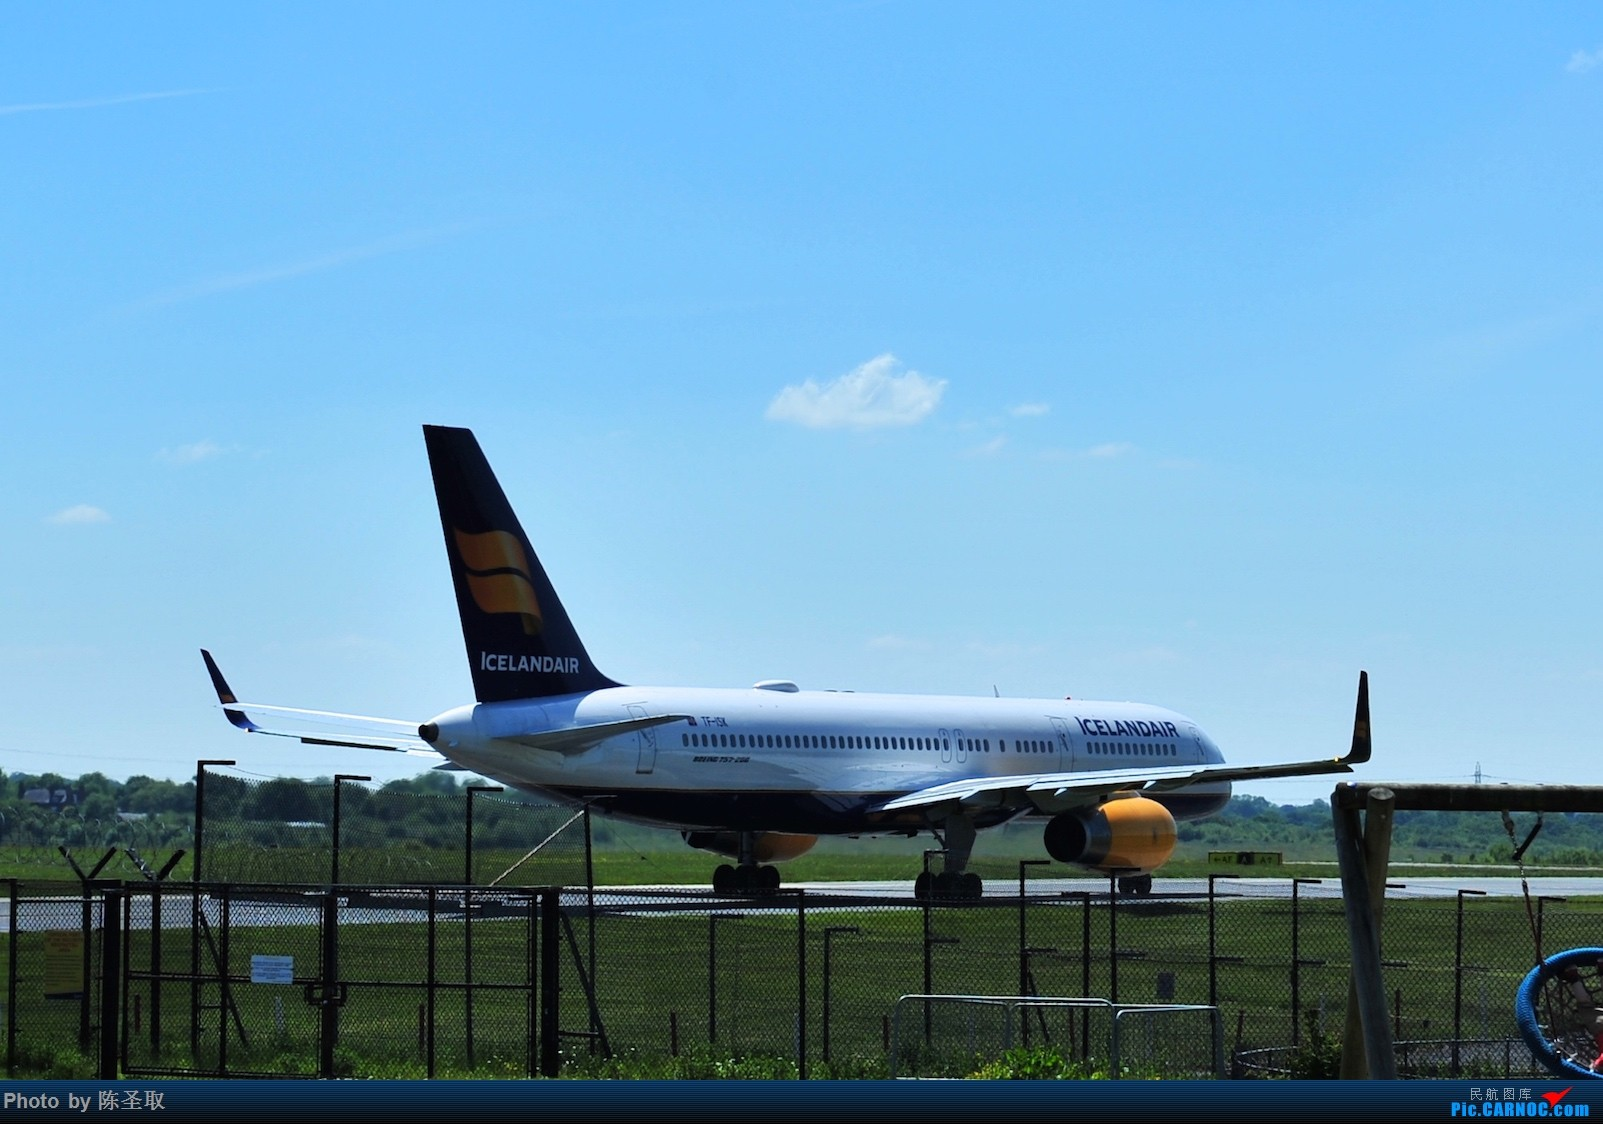 Re:[原创]迟来的6月曼城拍机图。廉价航空的天堂,曼彻斯特机场~ BOEING 757-223(W) TF-ISK 英国曼彻斯特机场